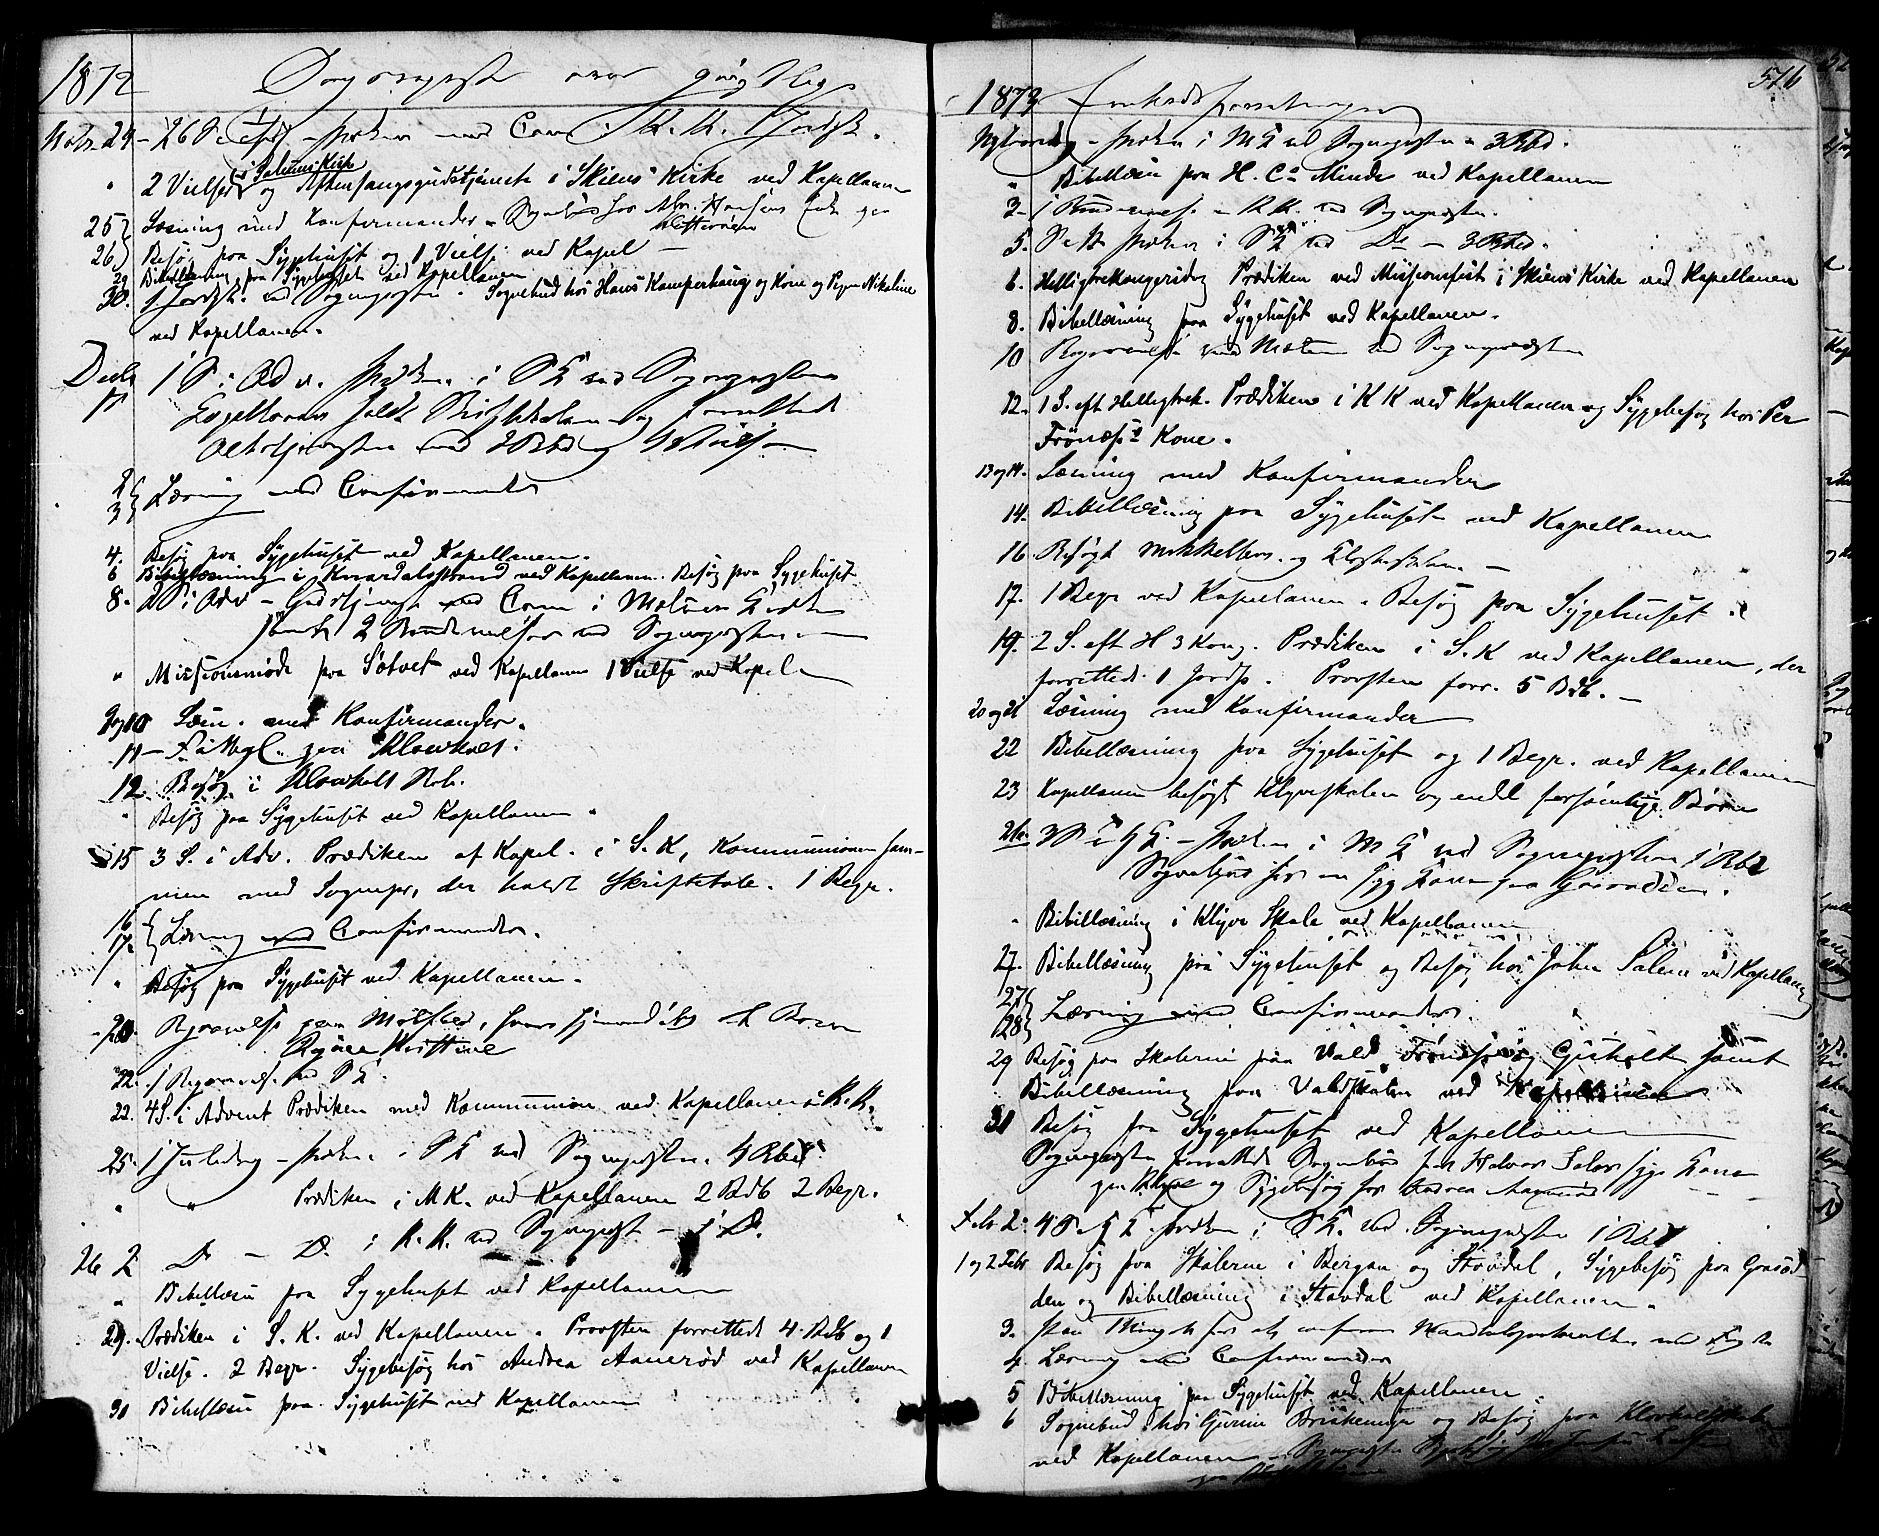 SAKO, Solum kirkebøker, F/Fa/L0008: Ministerialbok nr. I 8, 1865-1876, s. 516